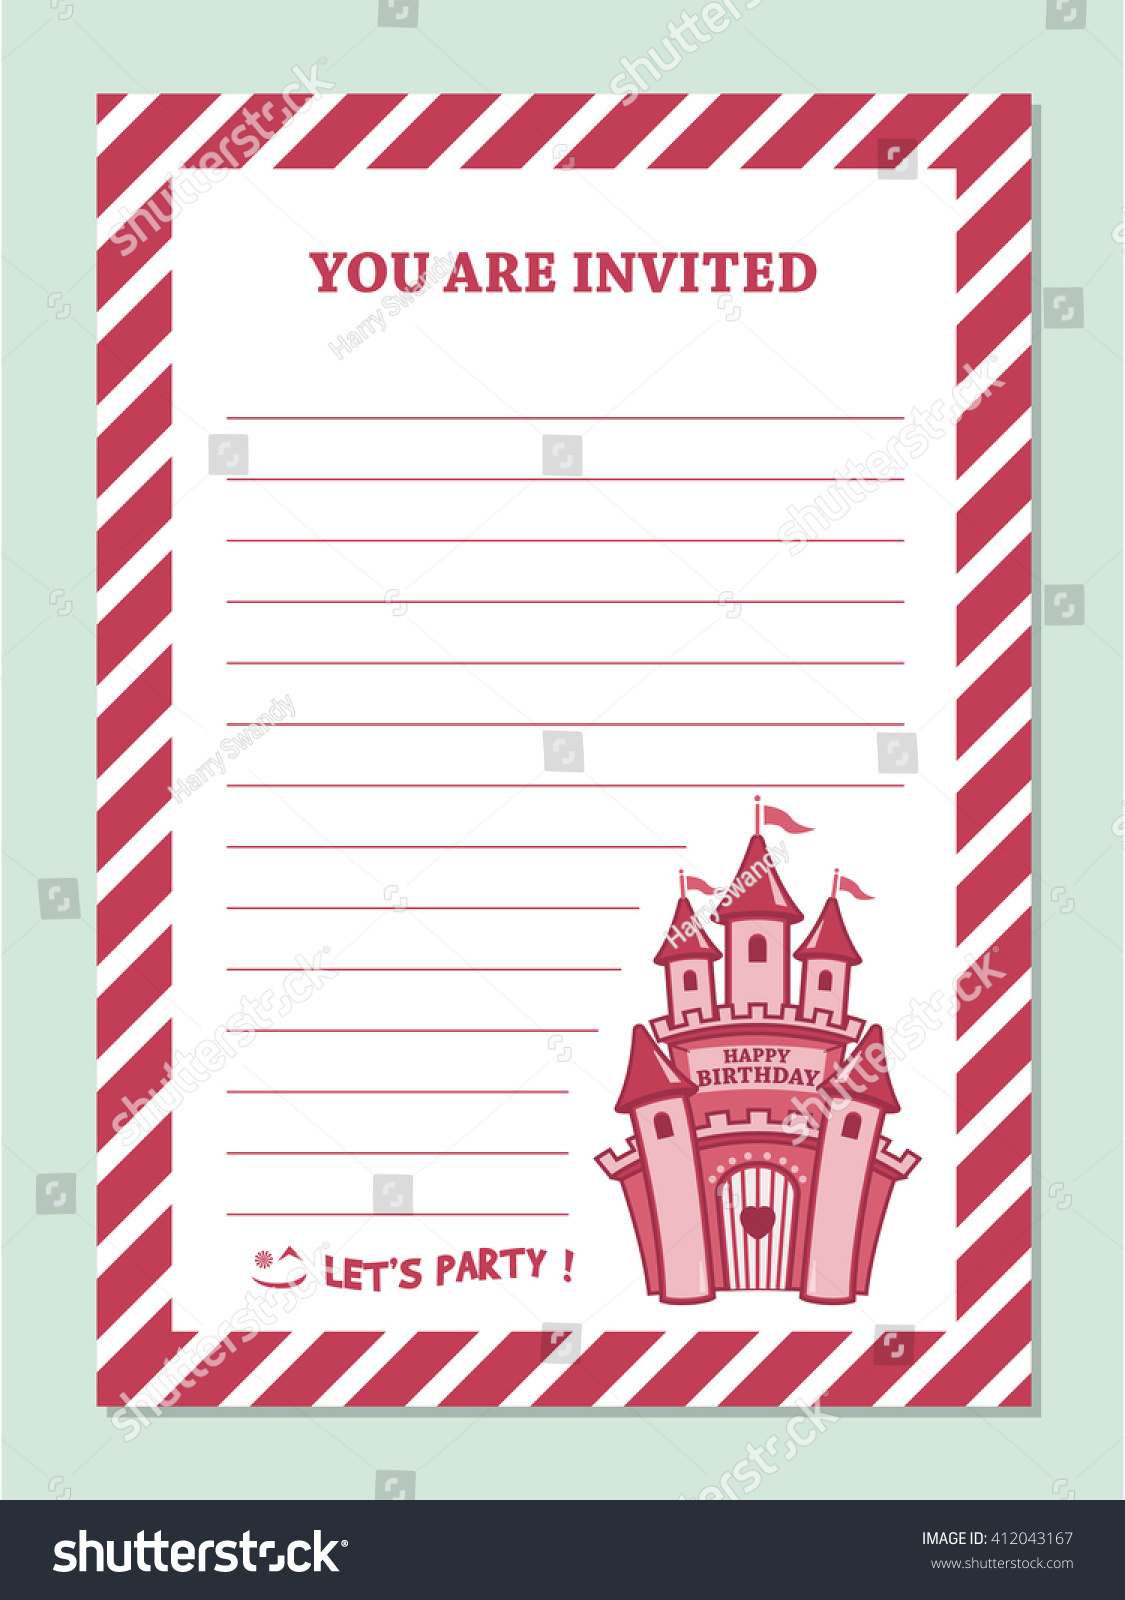 Princess Birthday Party Invitation Card Template Stock Vector ...